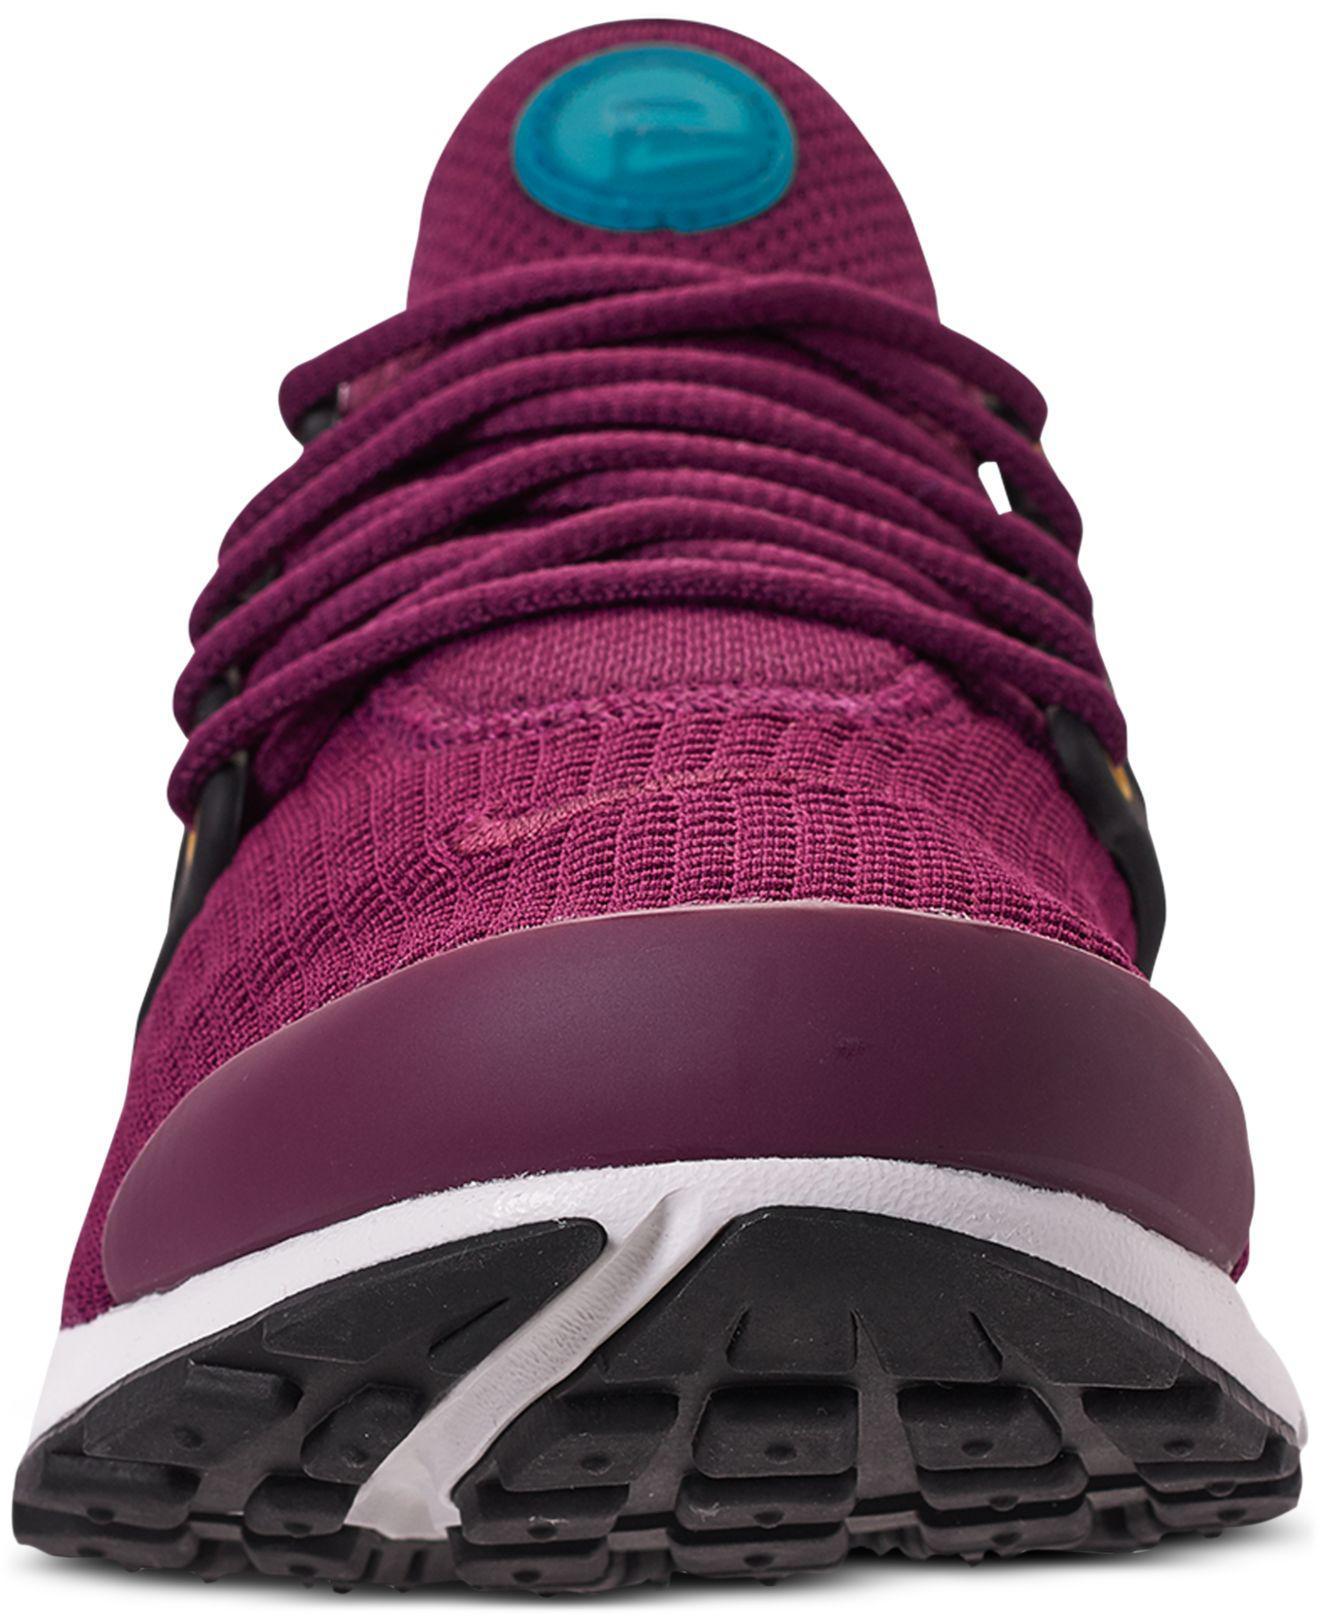 24730bd8efec Nike - Purple Air Presto Running Sneakers From Finish Line - Lyst. View  fullscreen